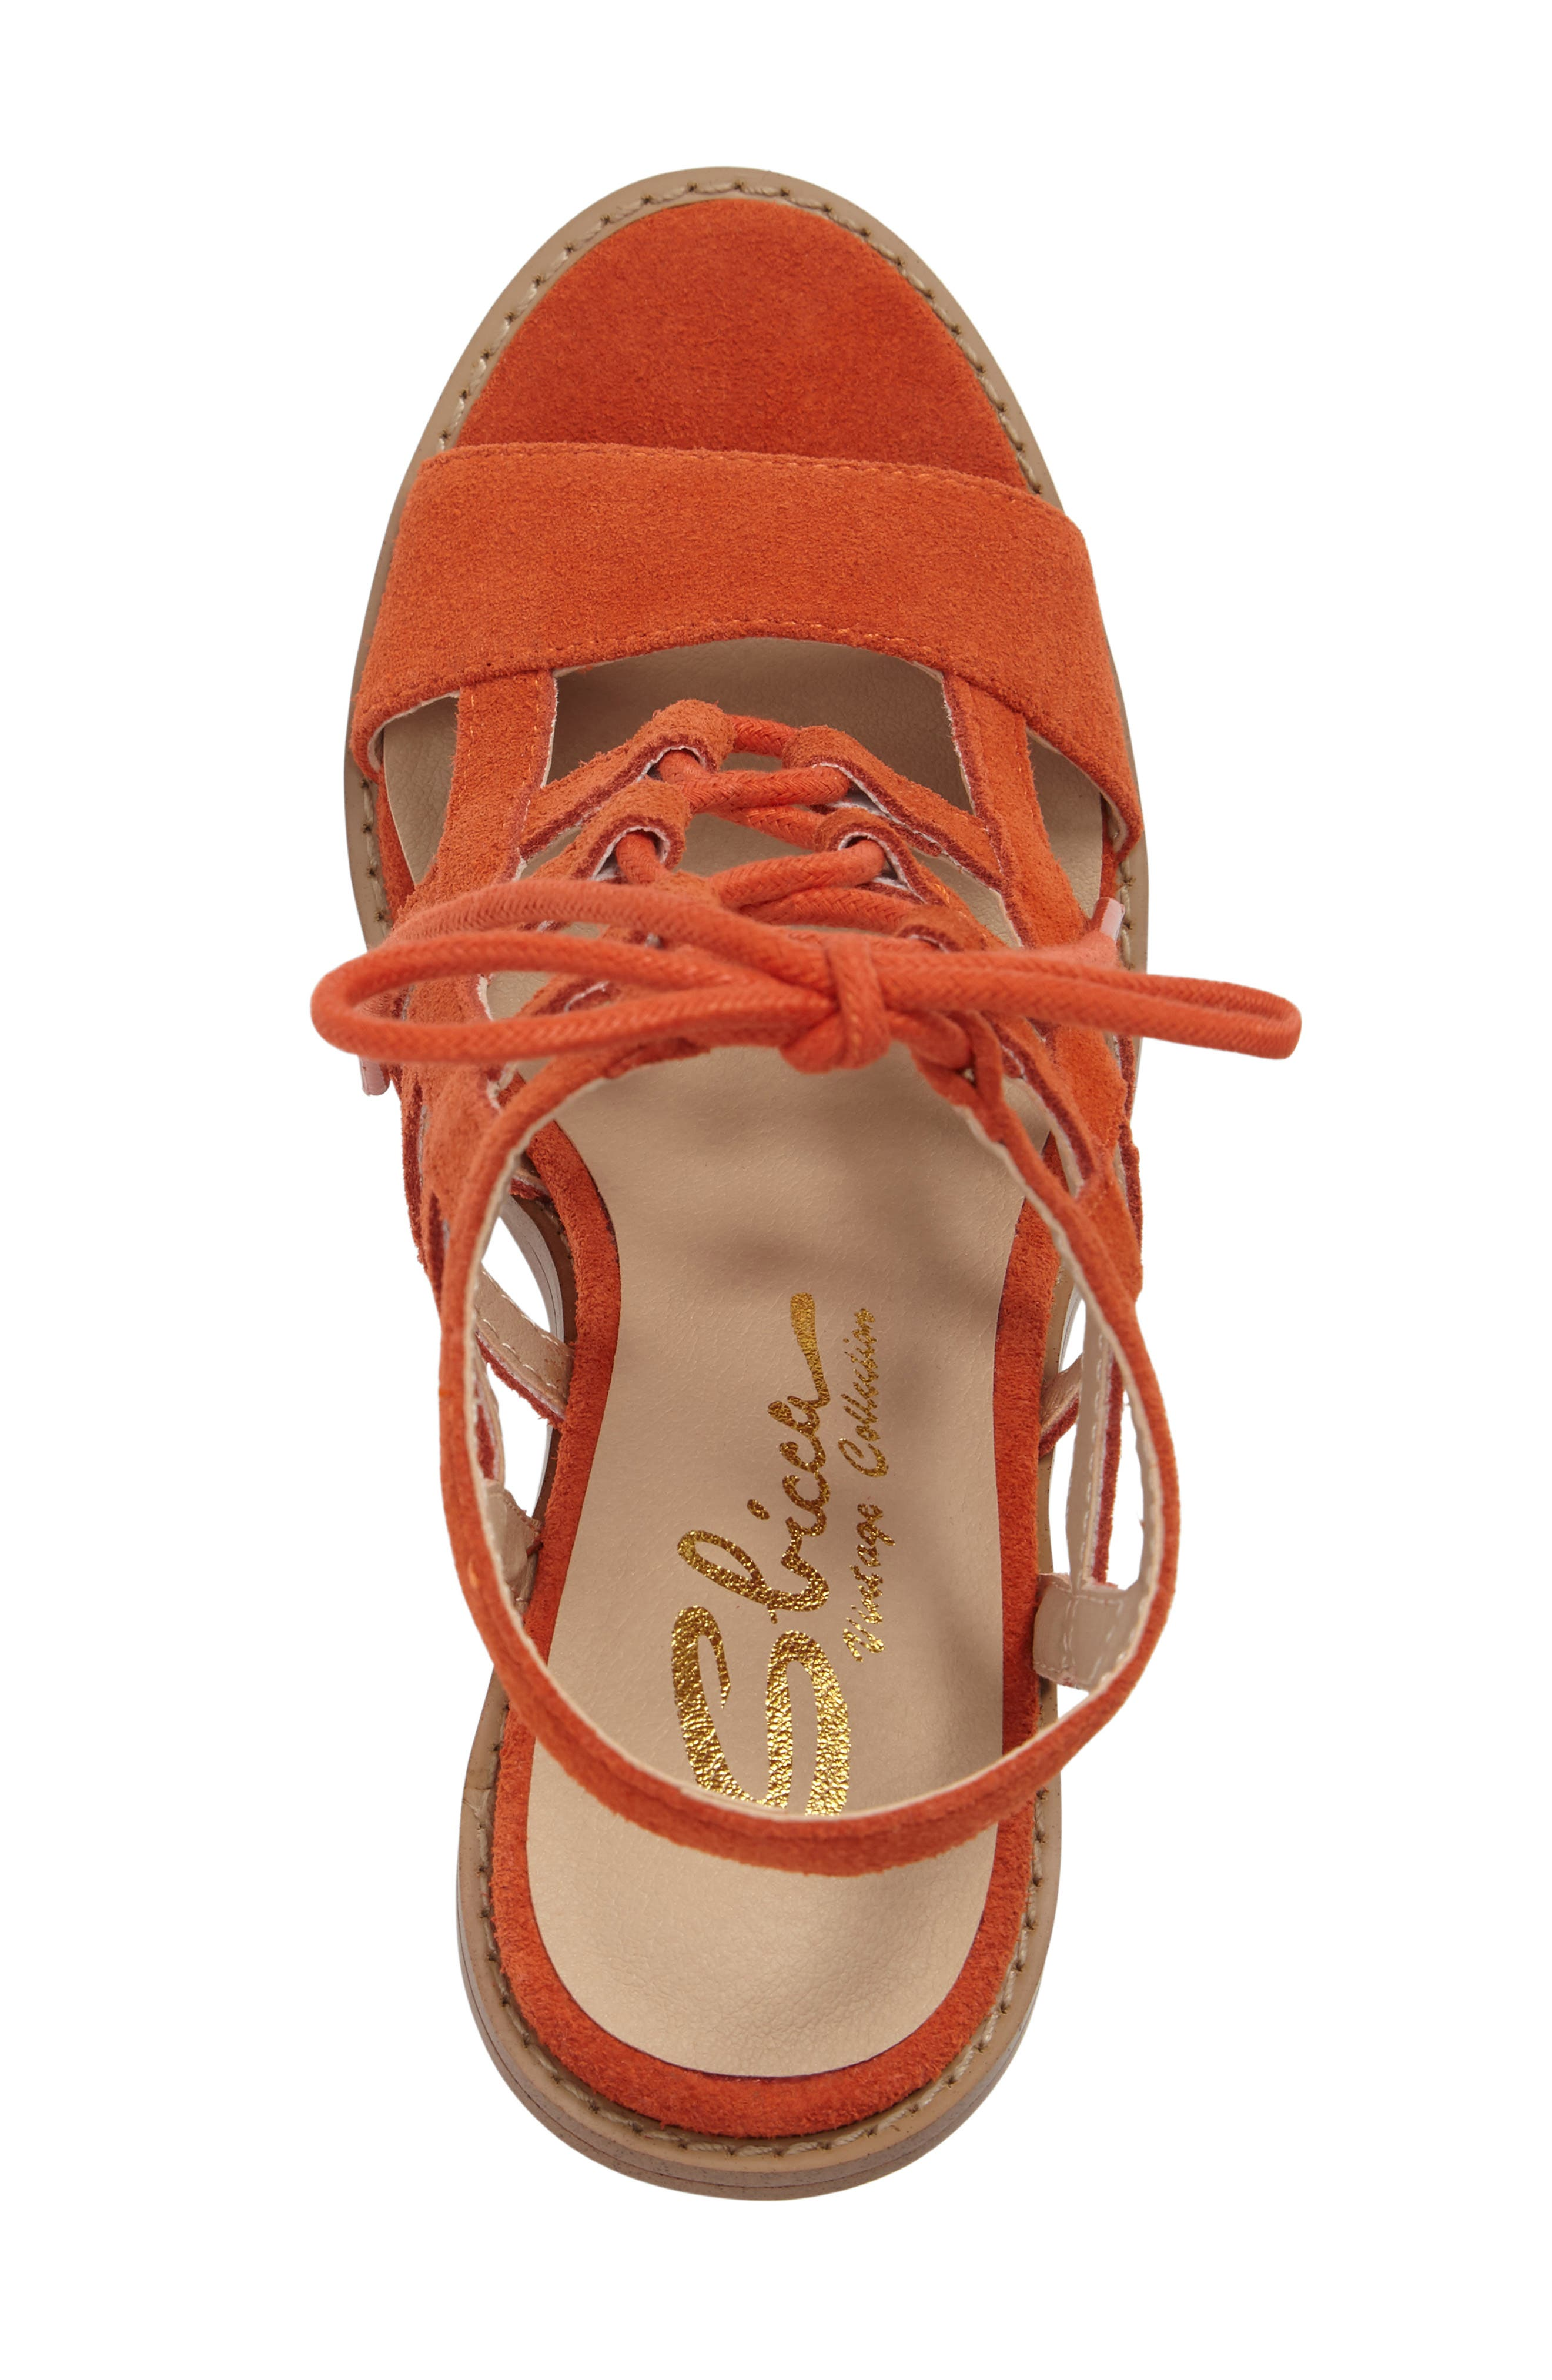 Sanni Cage Sandal,                             Alternate thumbnail 5, color,                             Orange Leather